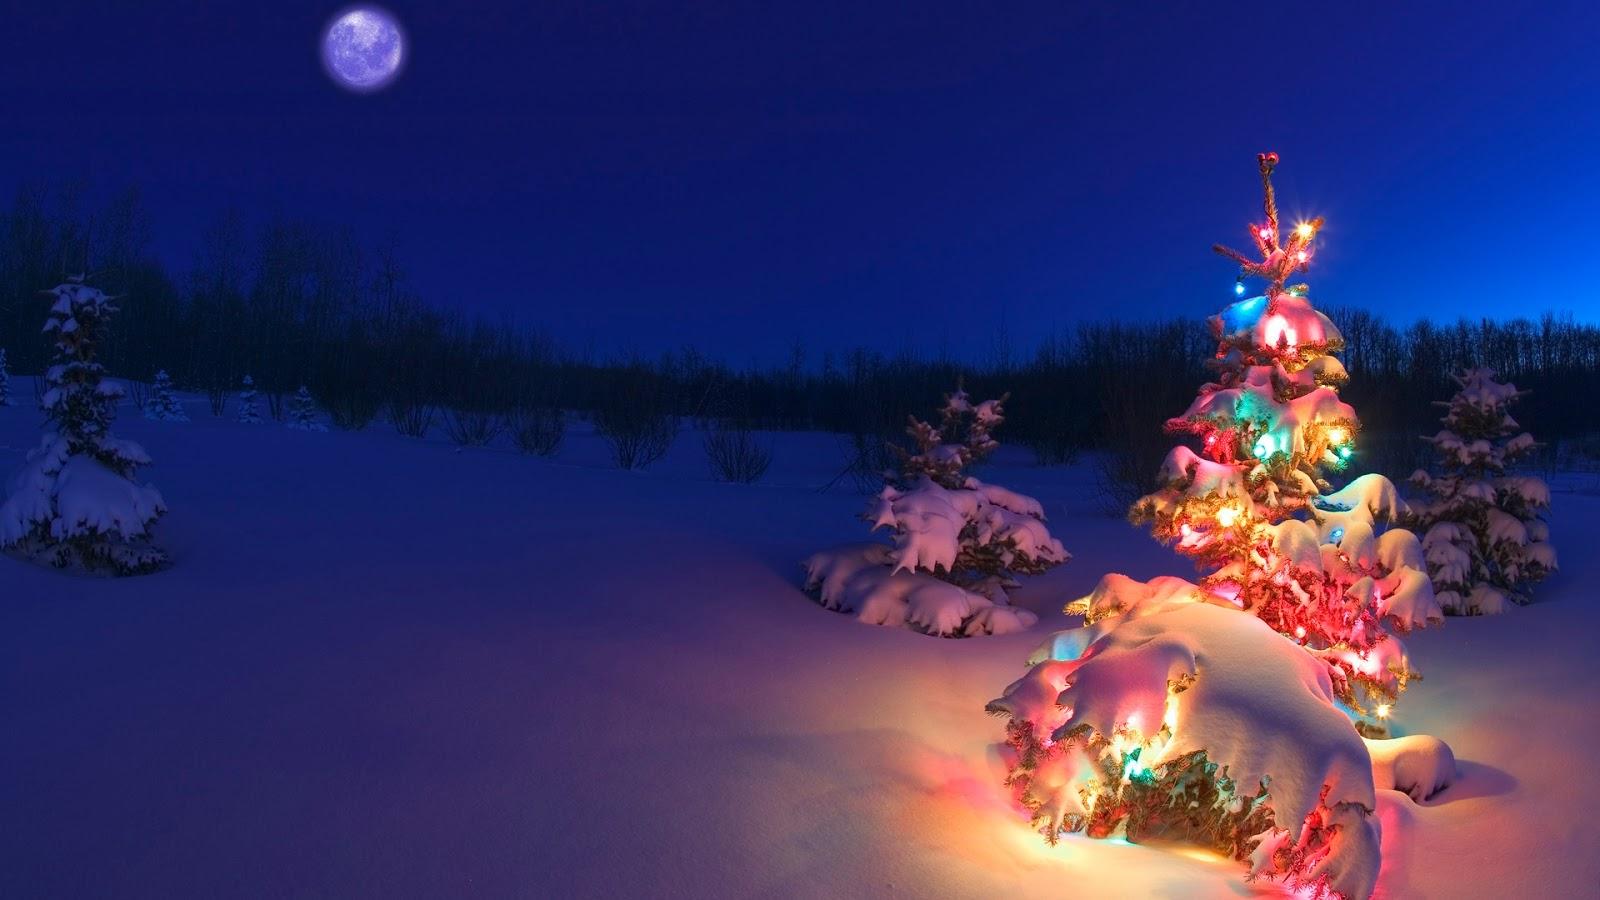 Hd Christmas Wallpaper Decorated Digital Hd Snowfall Tree Wallpaper Events 3145